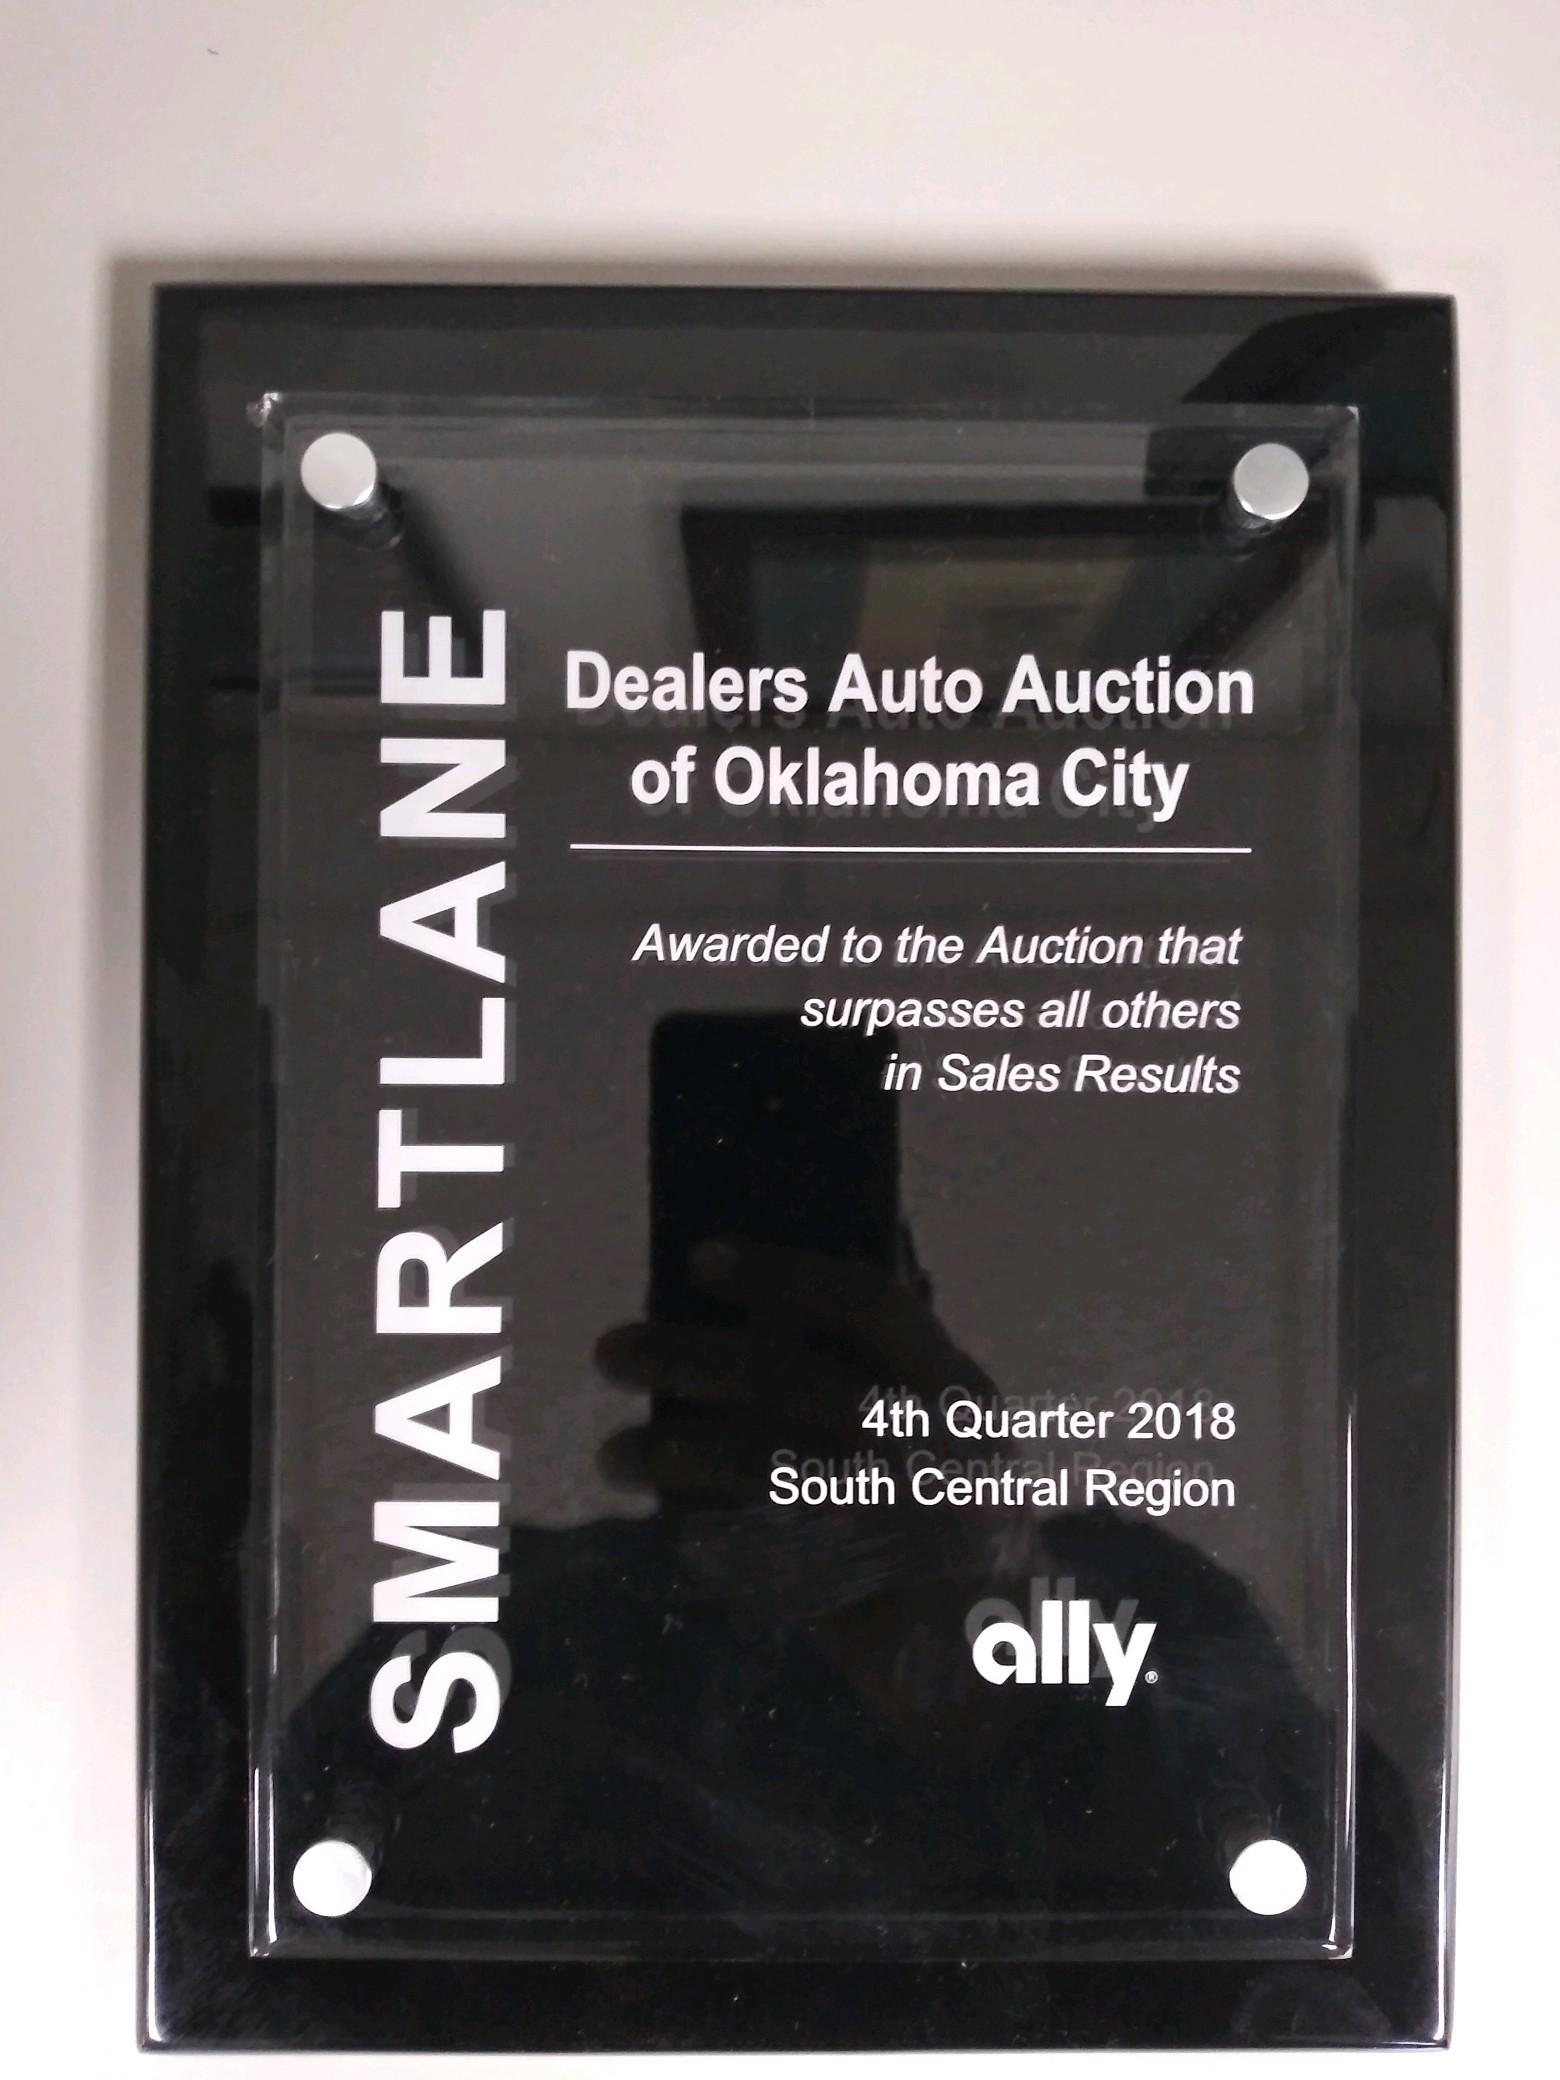 Dealer's Auto Auction of Oklahoma City